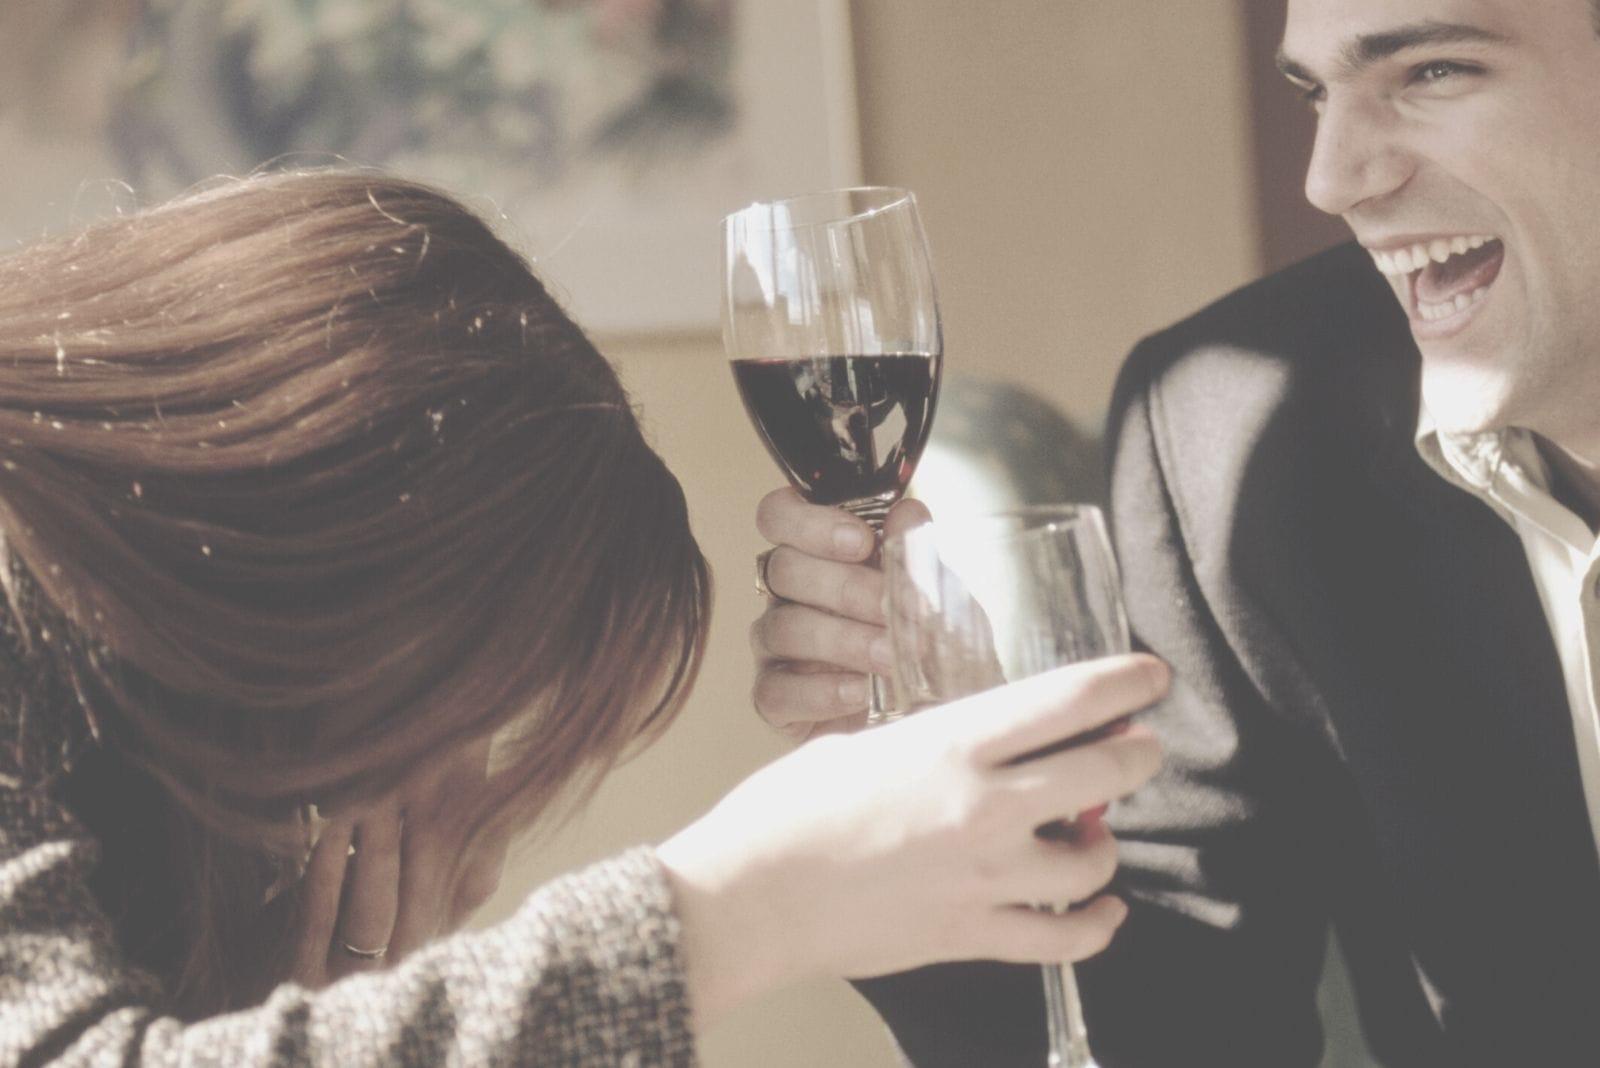 cheerful couple drinking wine laughing hard